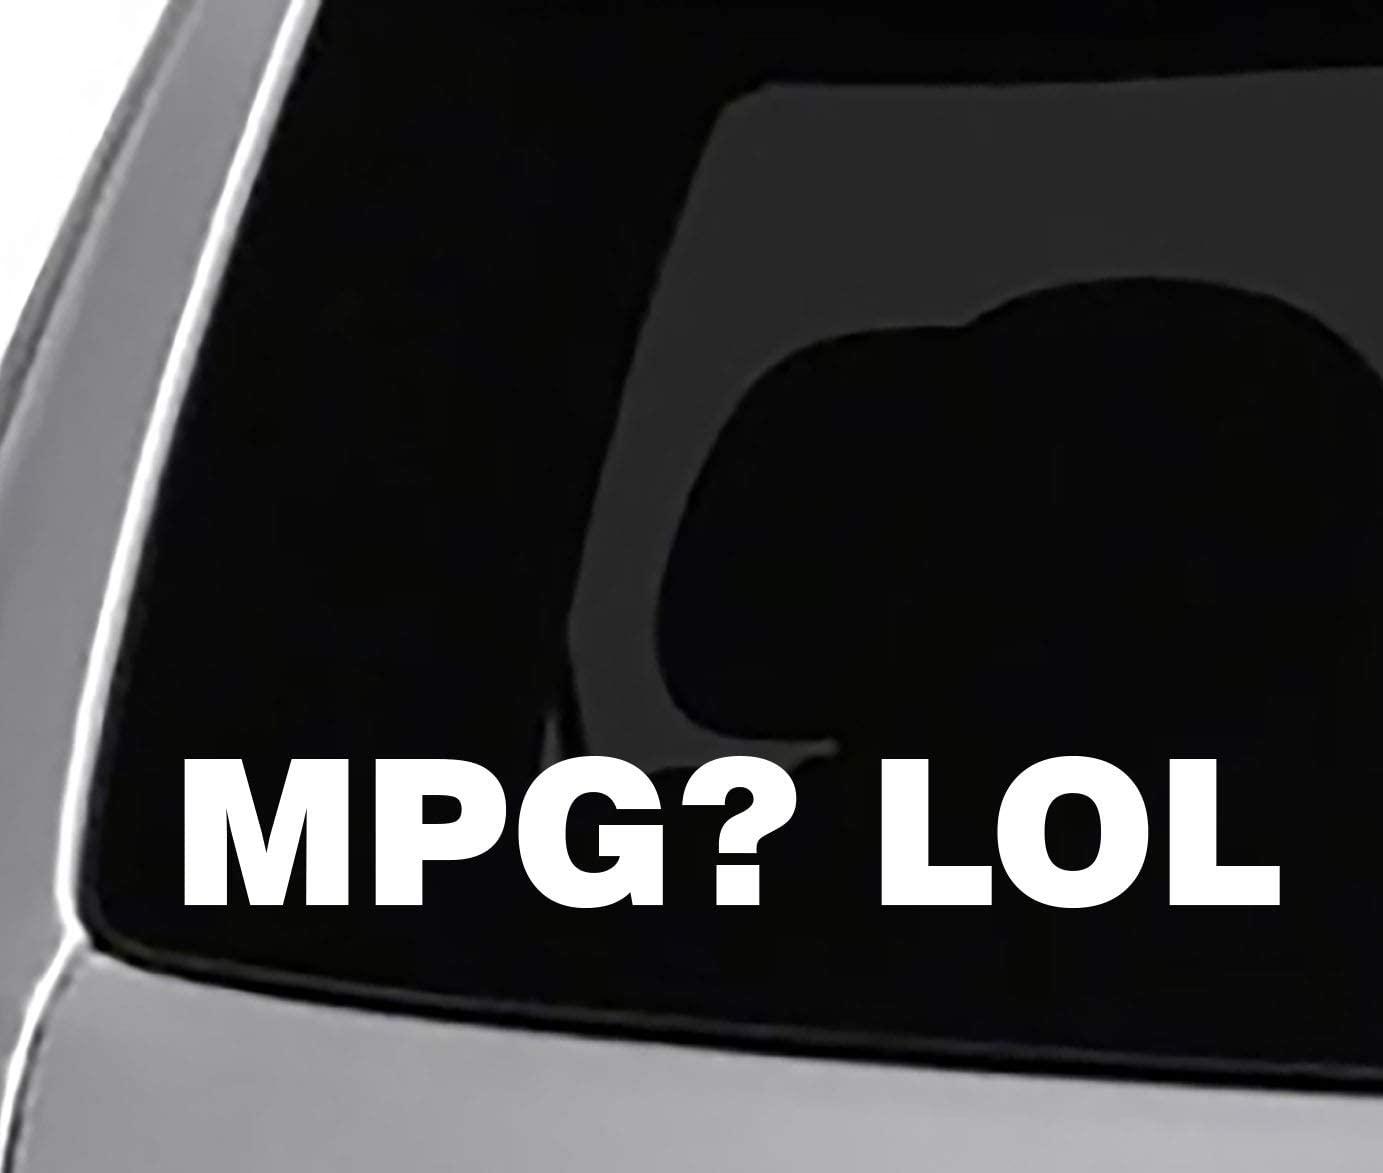 Seek Racing MPG LOL Decal CAR Truck Window Bumper Sticker Funny Joke Gas Guzzler